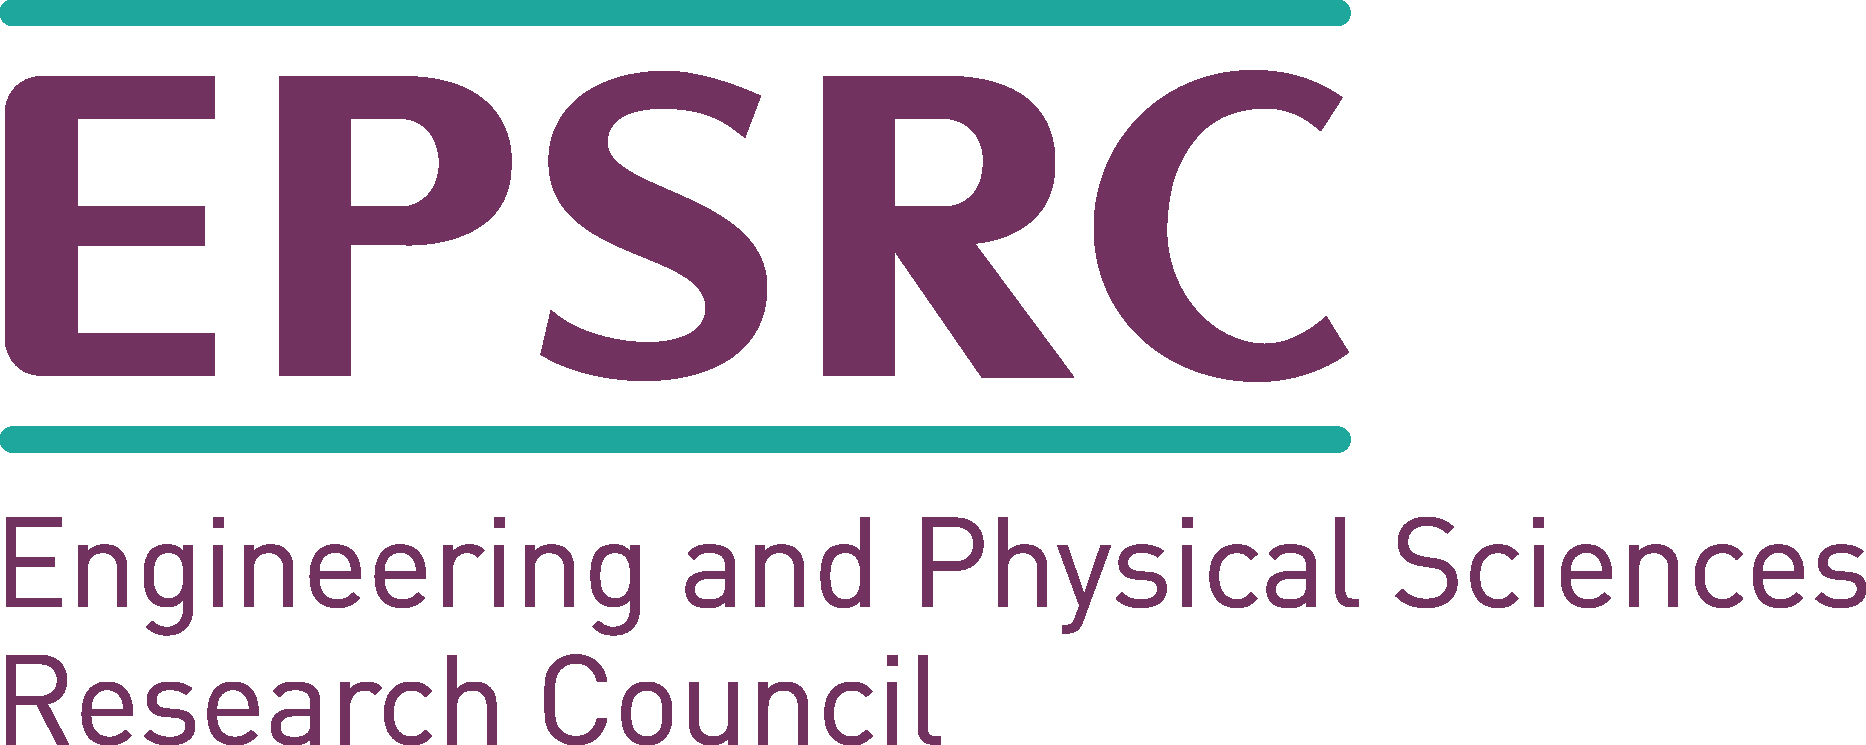 EPSRC_logo_sponsor_rgb